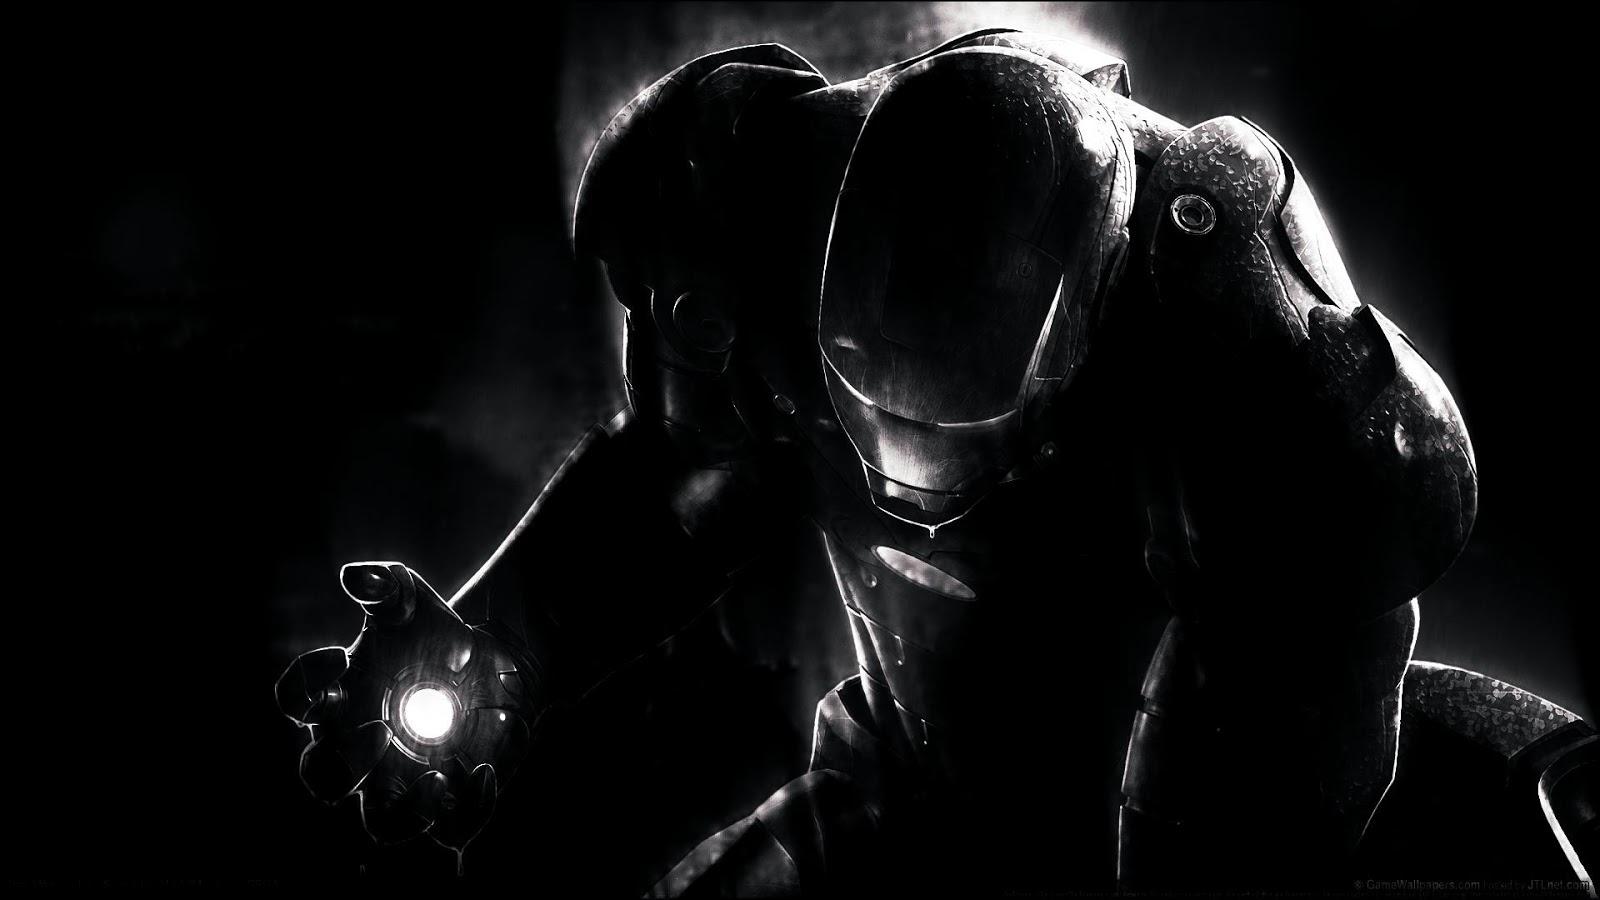 Iron Man High Quality Wallpaper 1080p HD